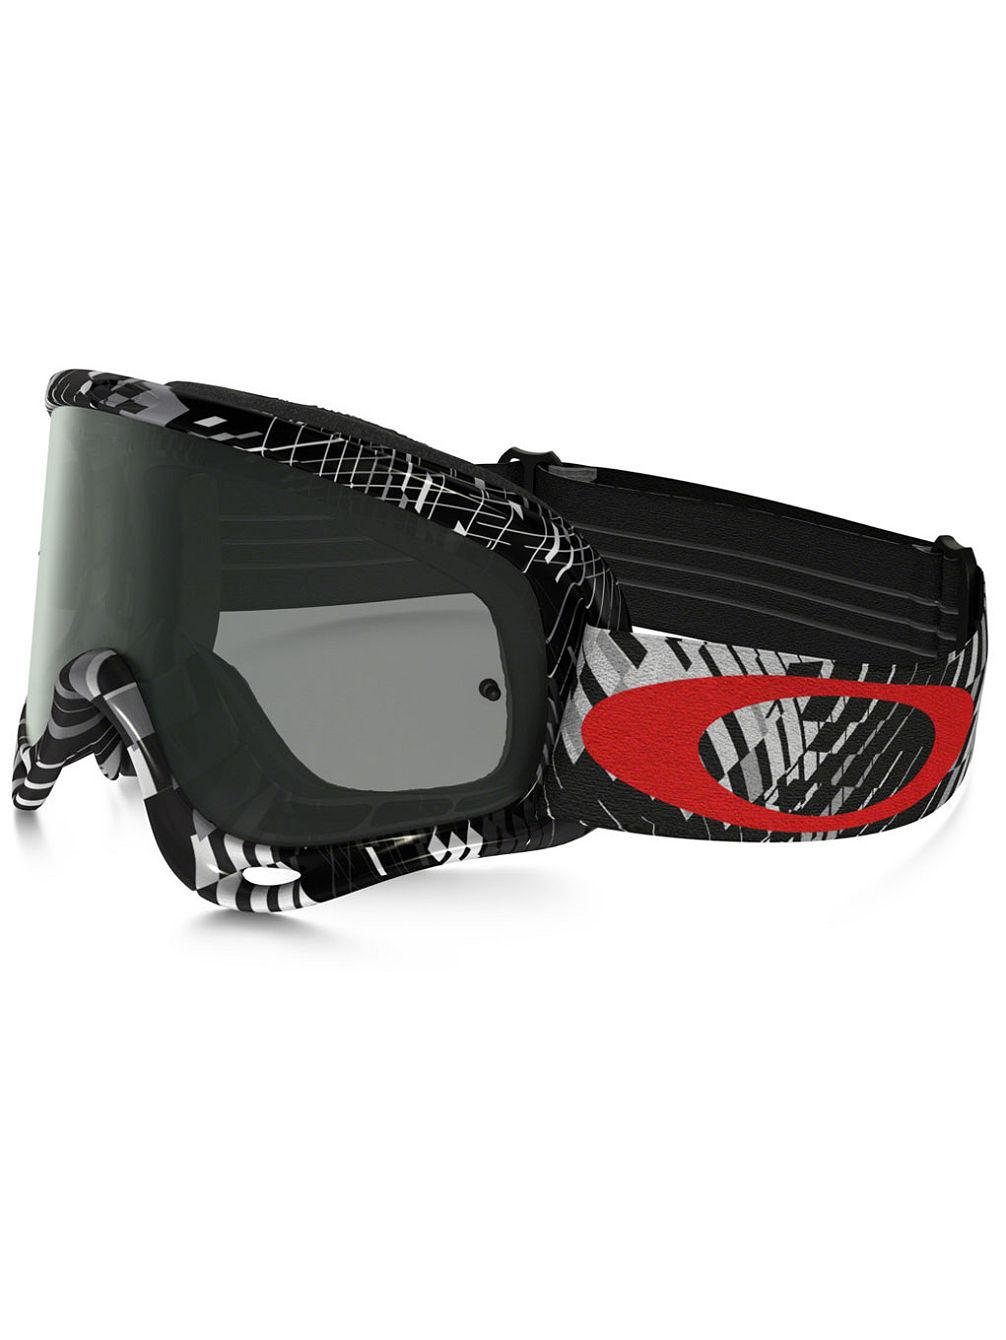 dfc0e9e418 Buy Oakley O Frame Mx Podium Check online at blue-tomato.com